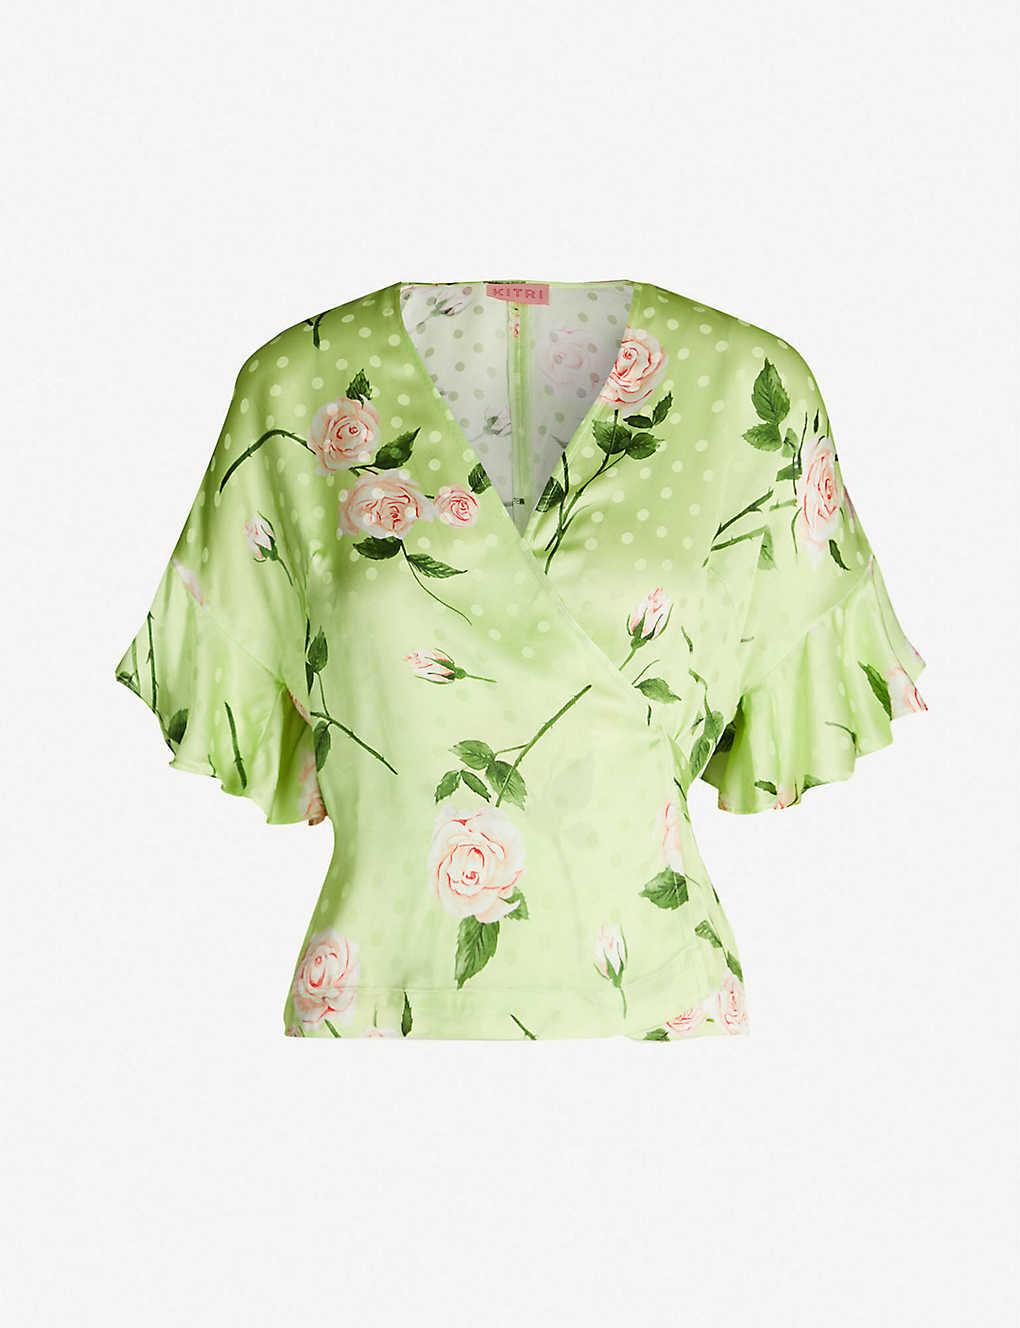 75ebf8cf608723 Alexis flared-cuff floral-print satin wrap top - Rose print ...